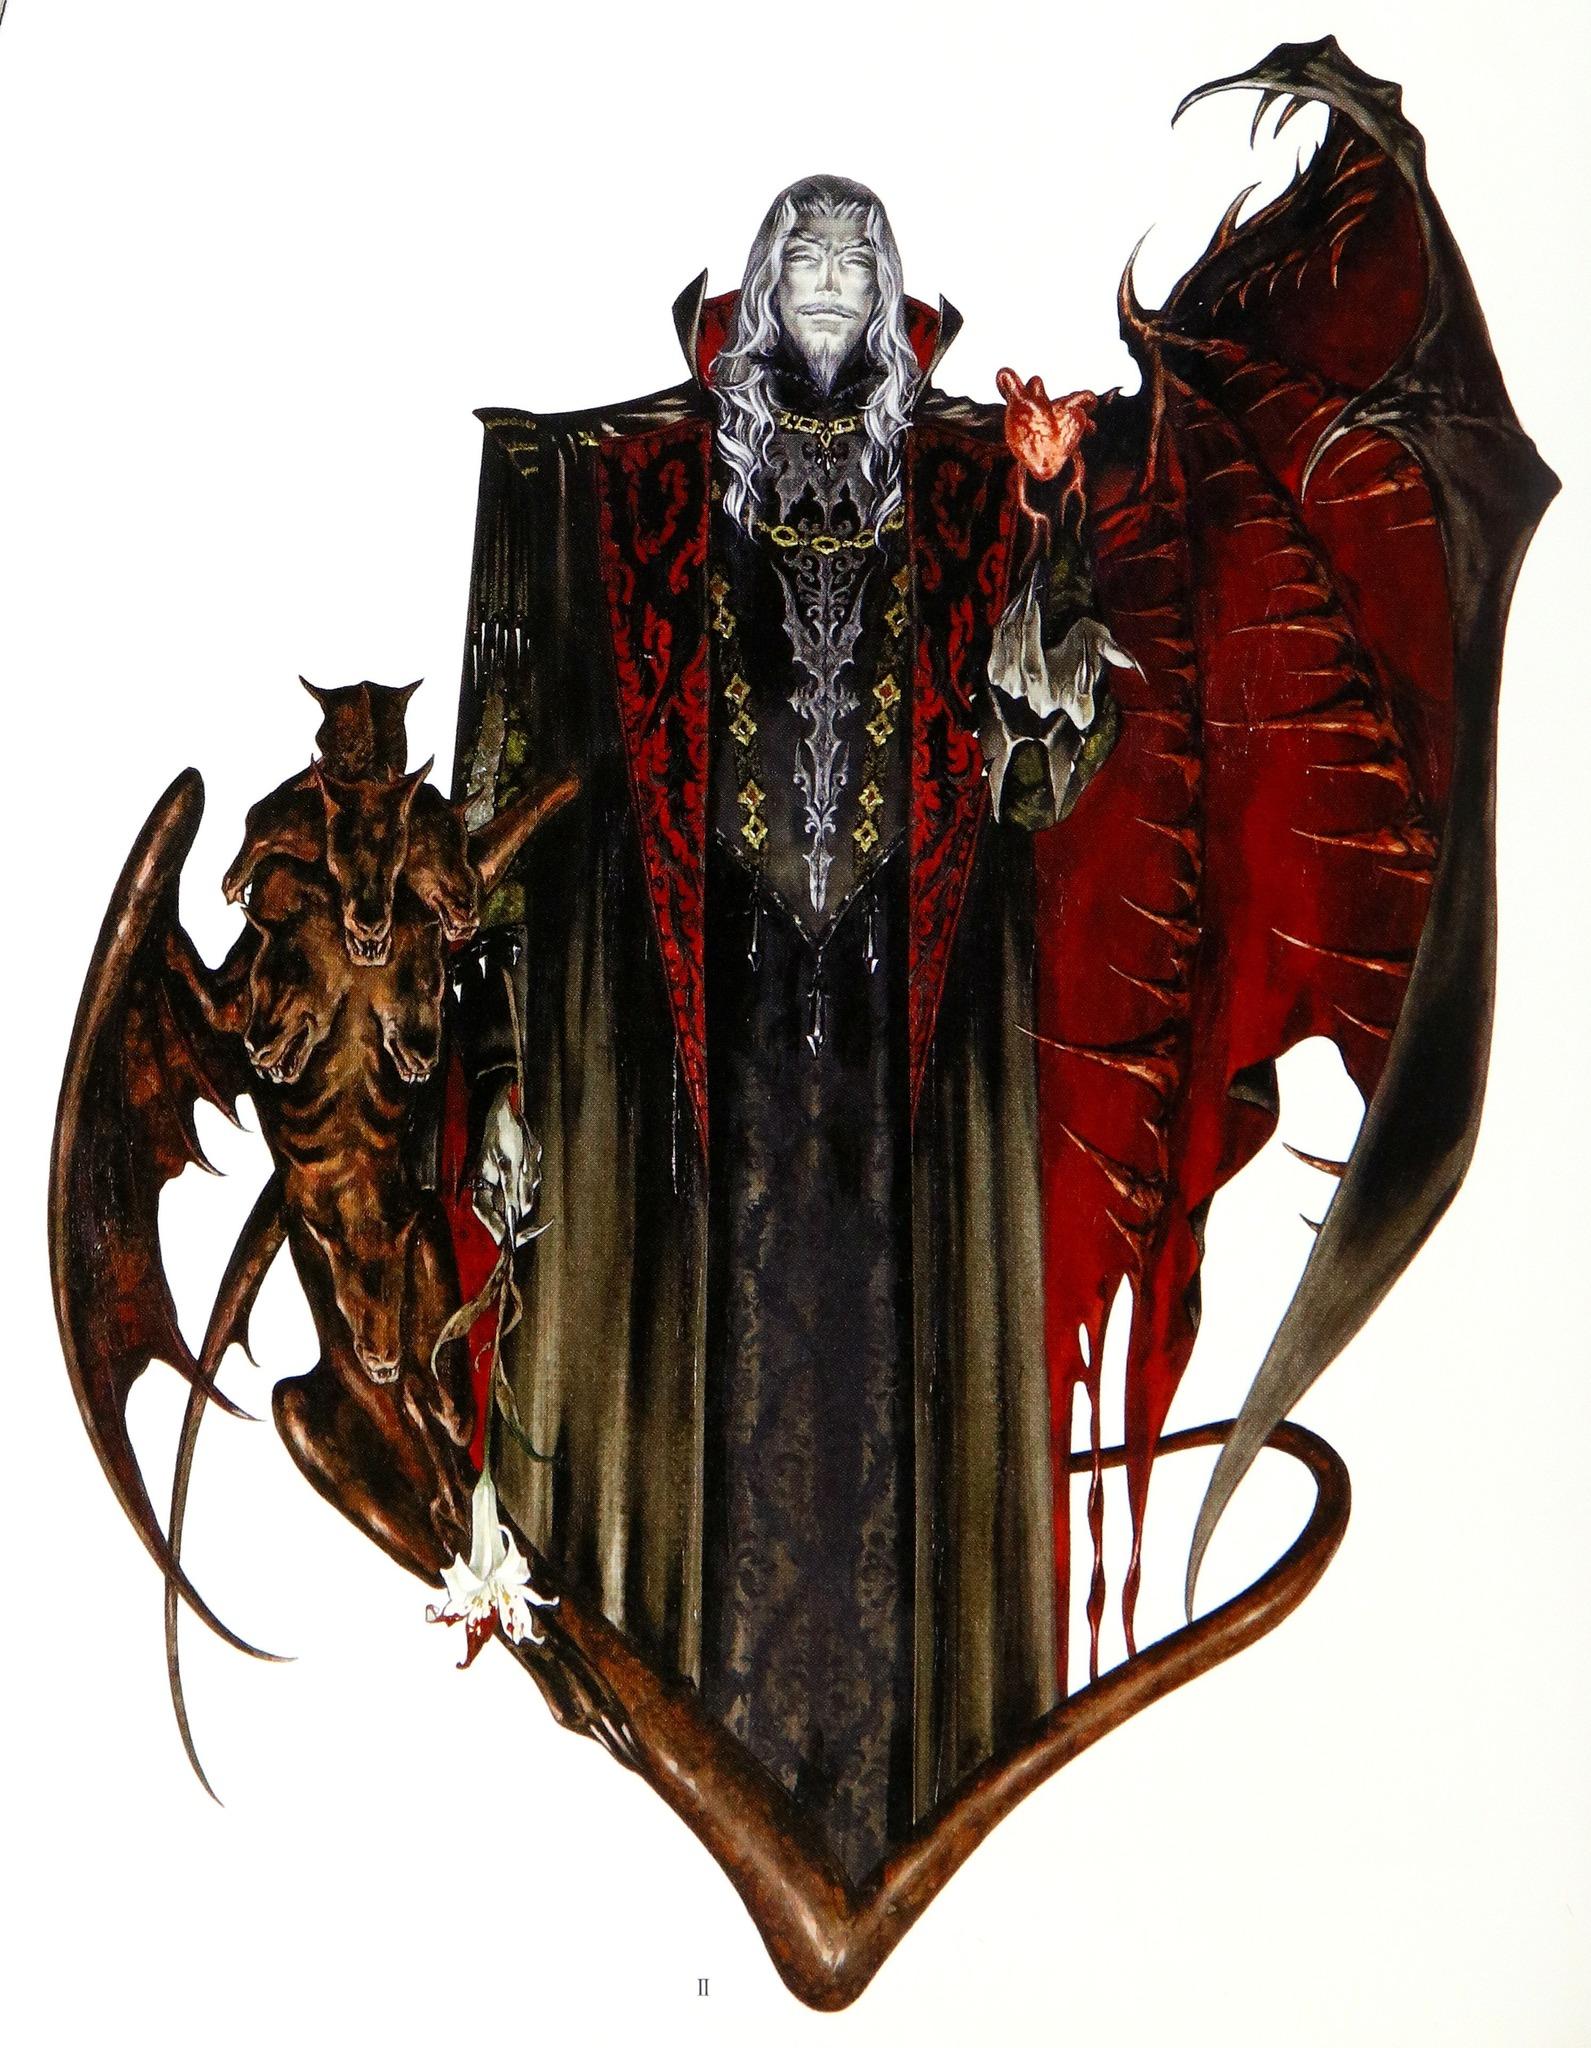 Dracula/Curse of Darkness